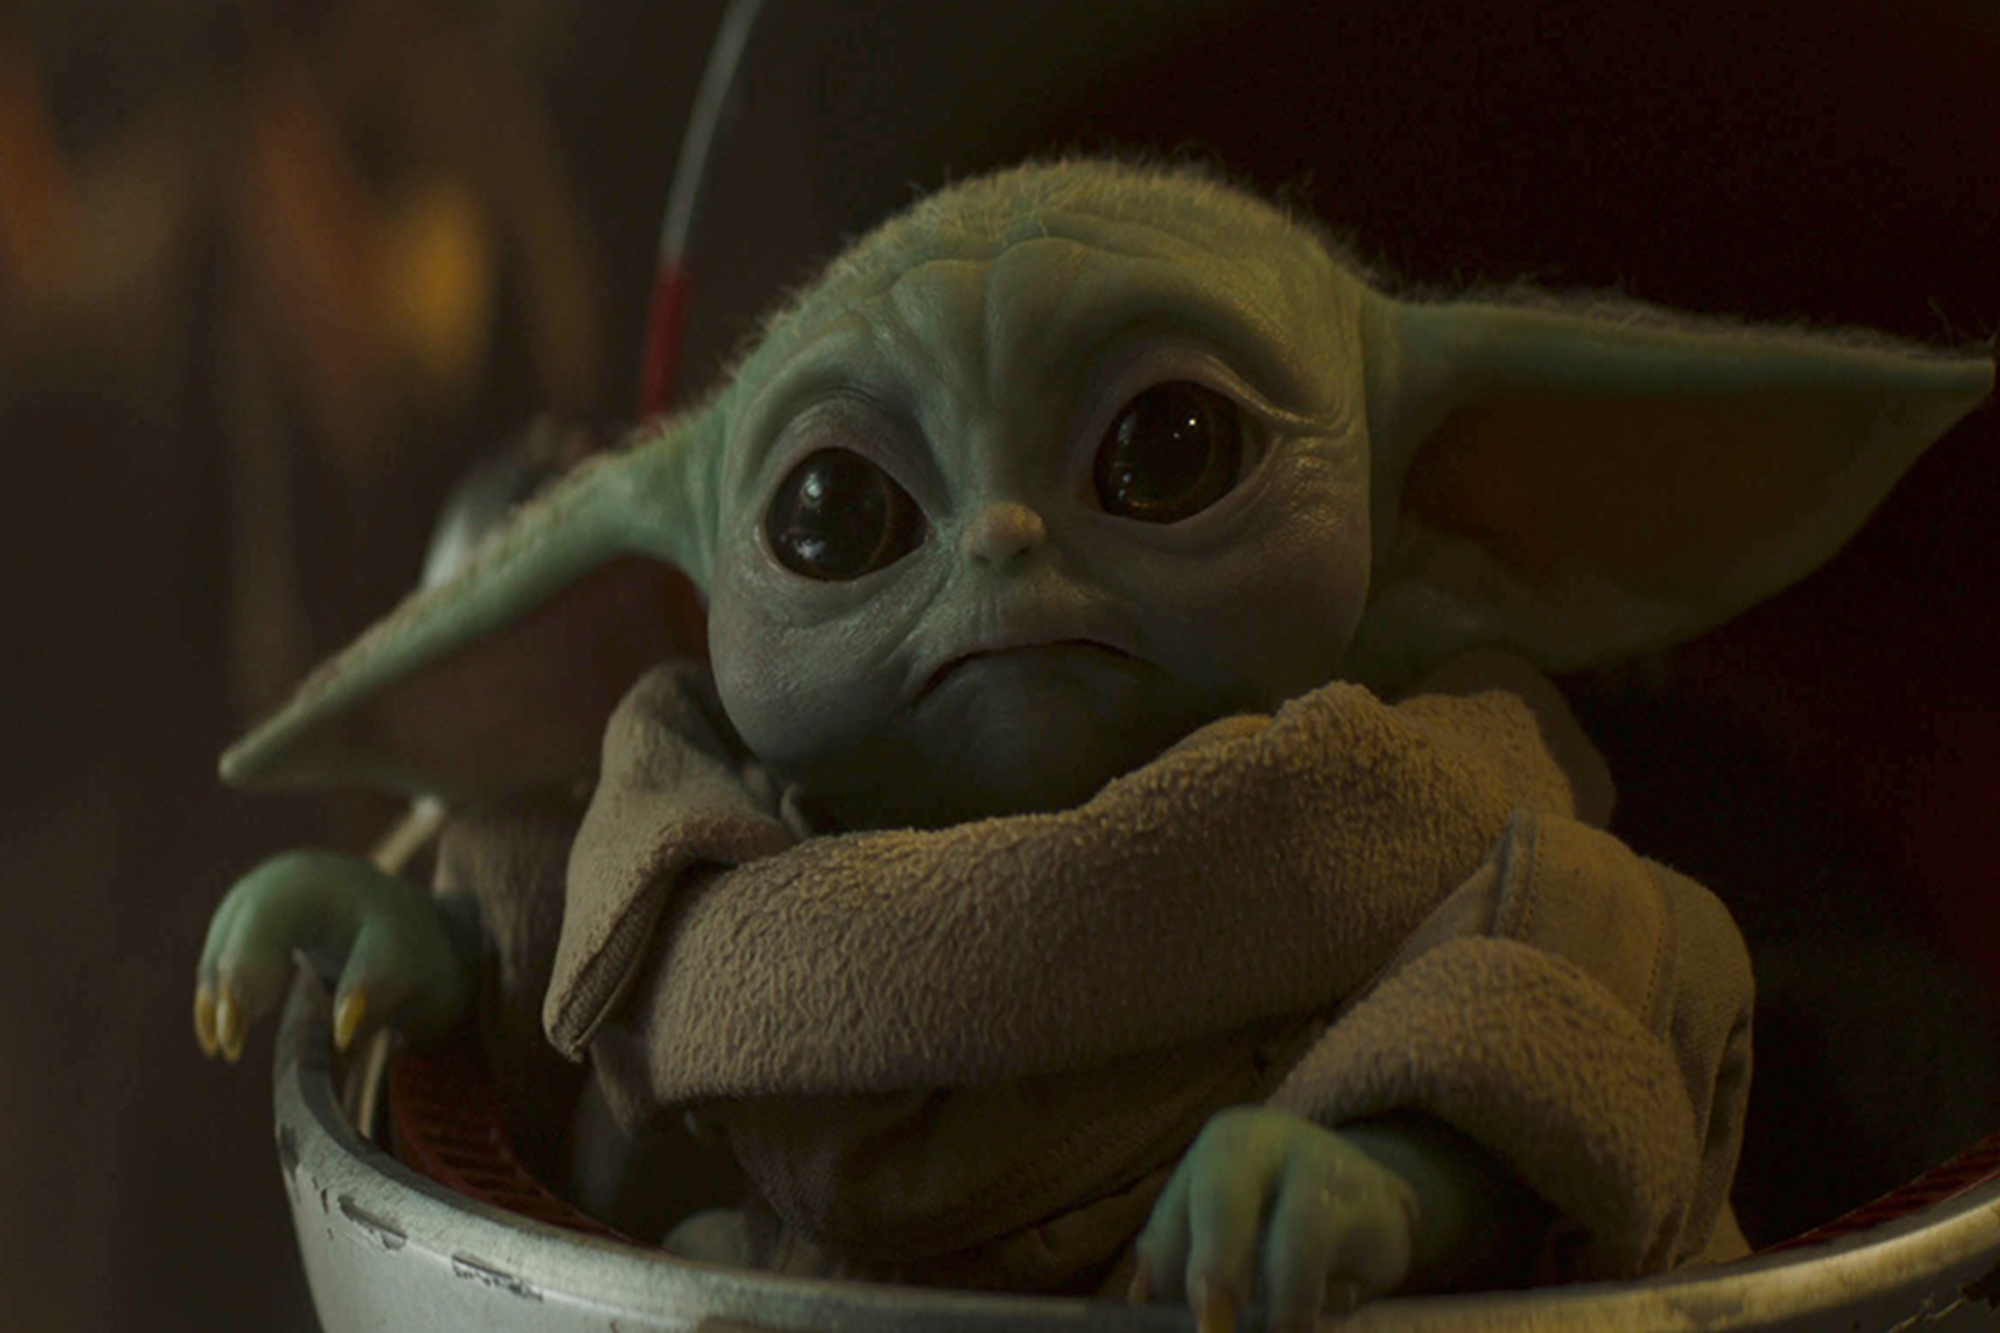 Lucasfilm defends Baby Yoda egg scene in 'The Mandalorian'